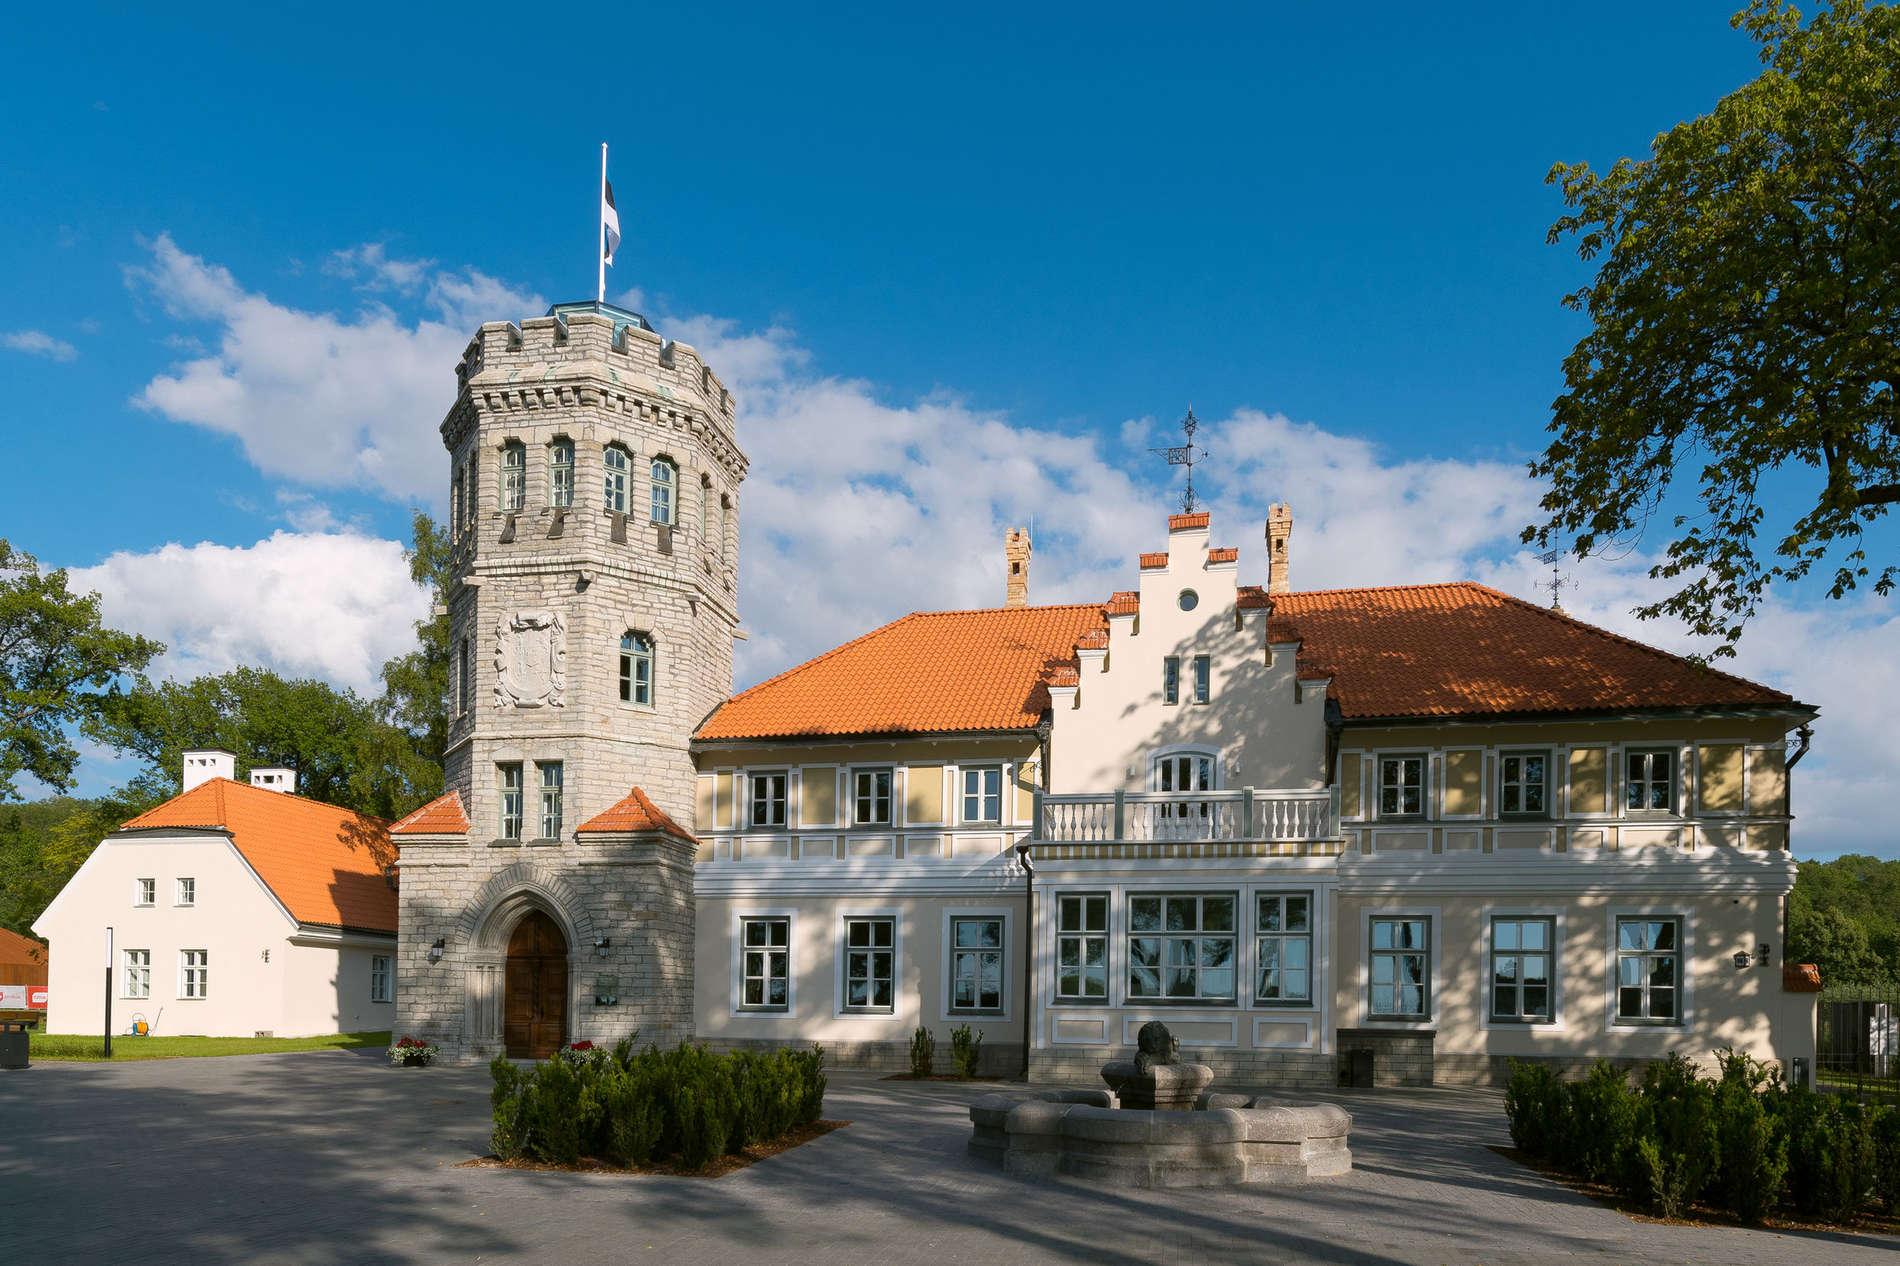 Estnisches Historisches Museum im Schloss Maarjamäe